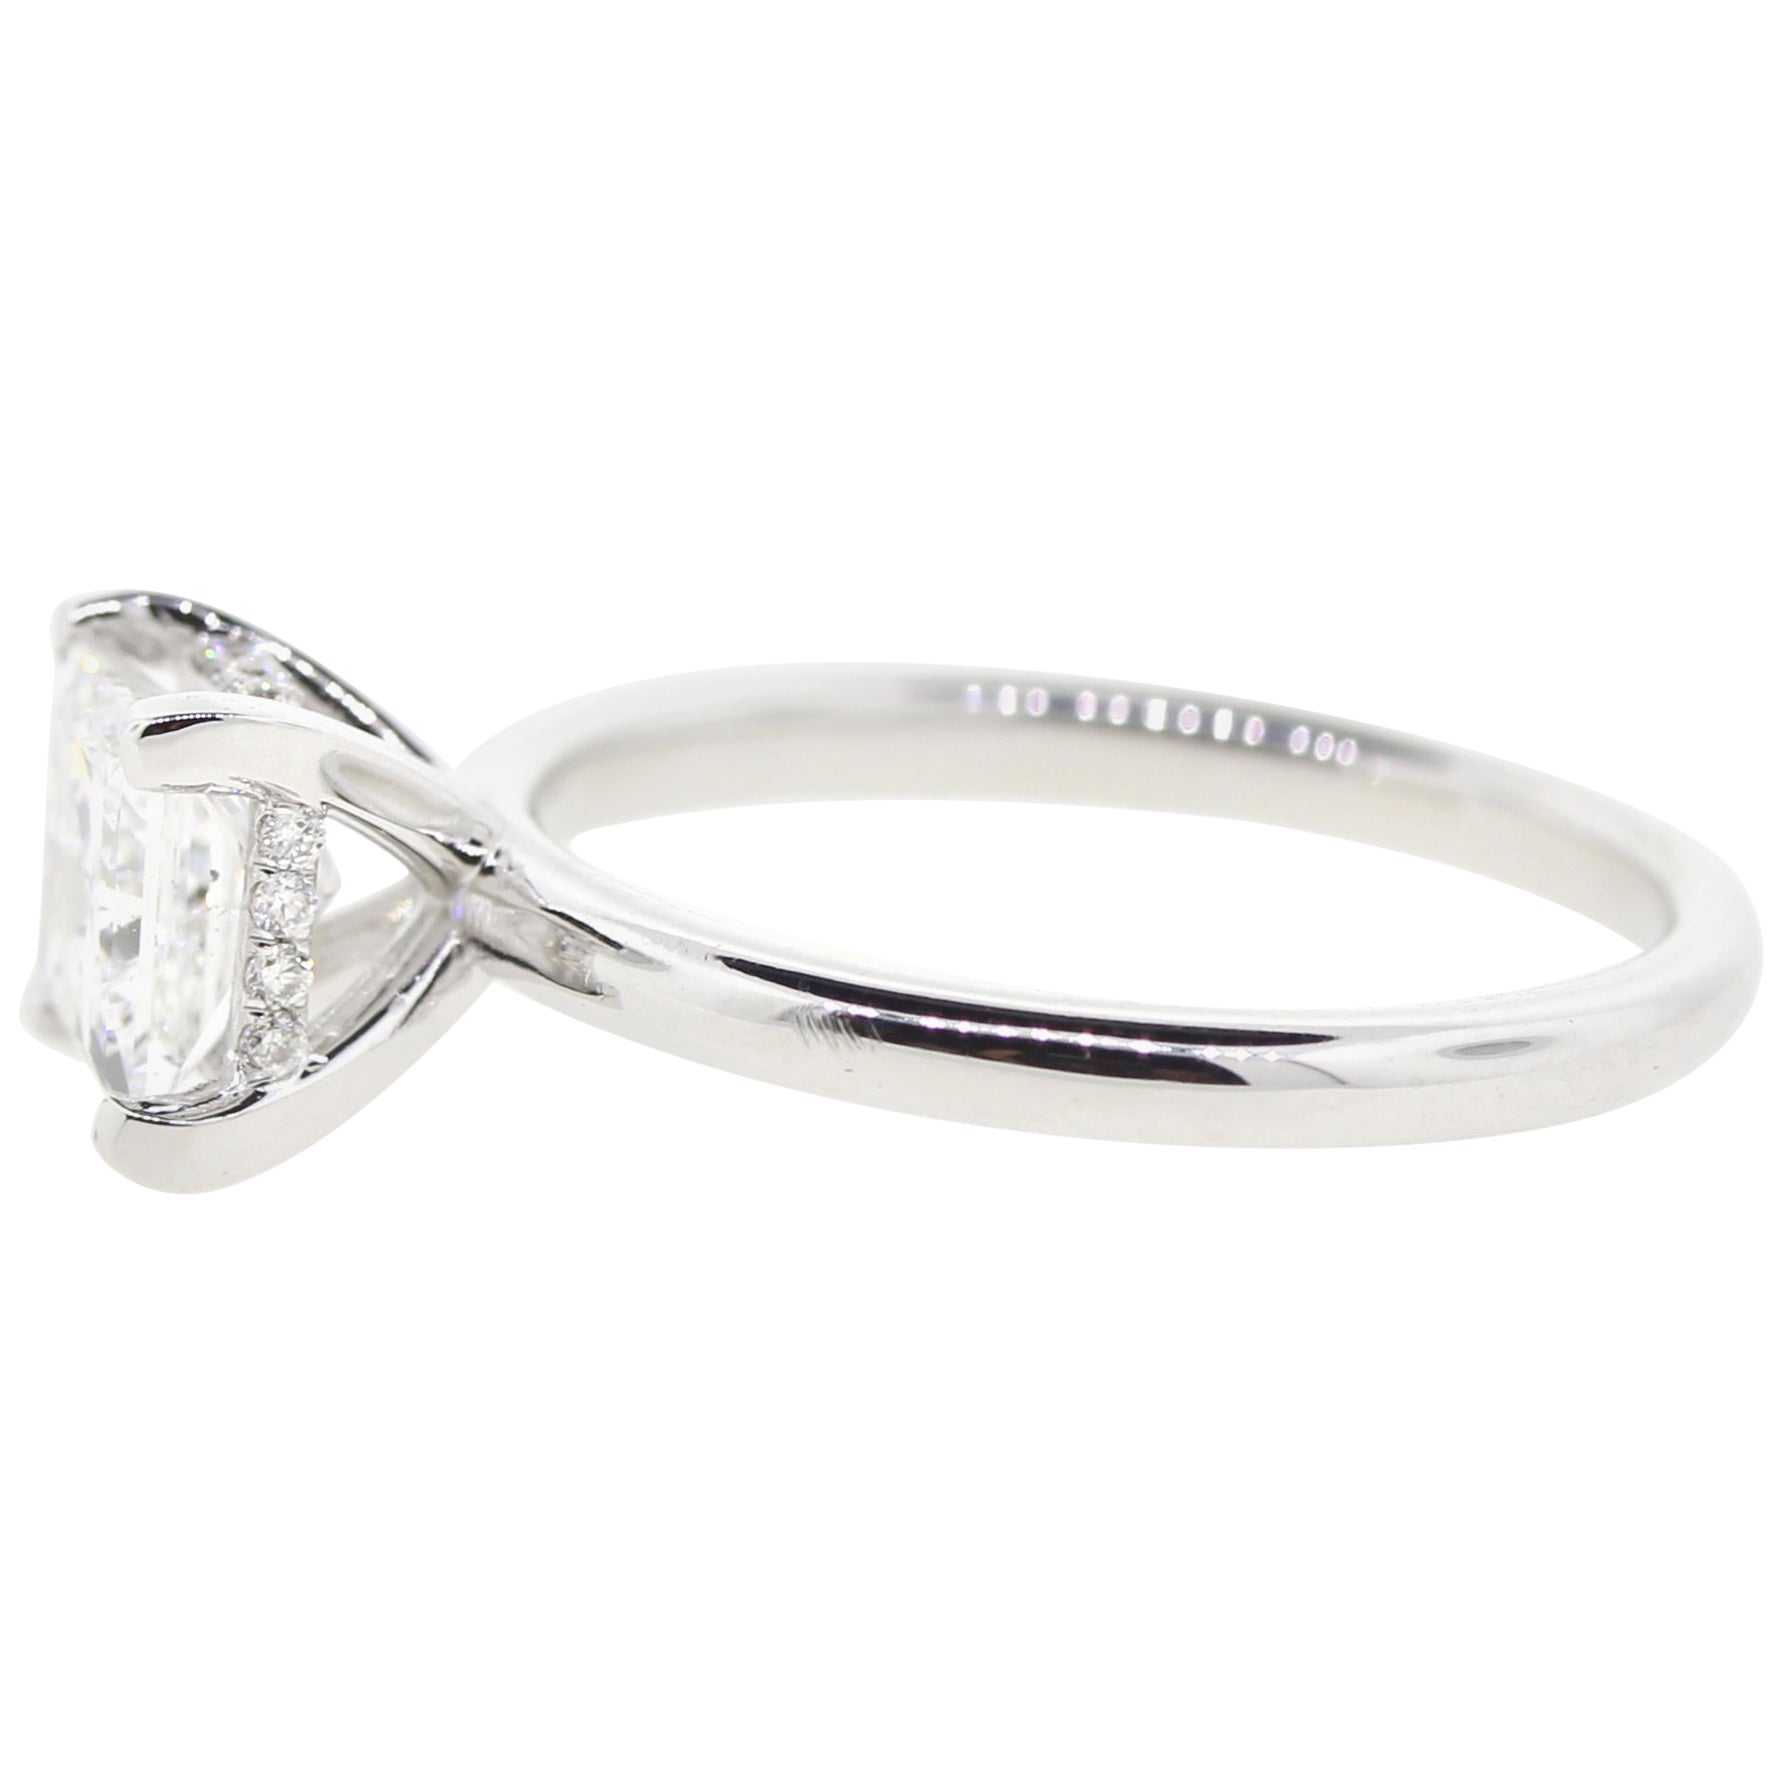 Hidden Halo Diamond Engagement Ring Princess Cut D Color GIA